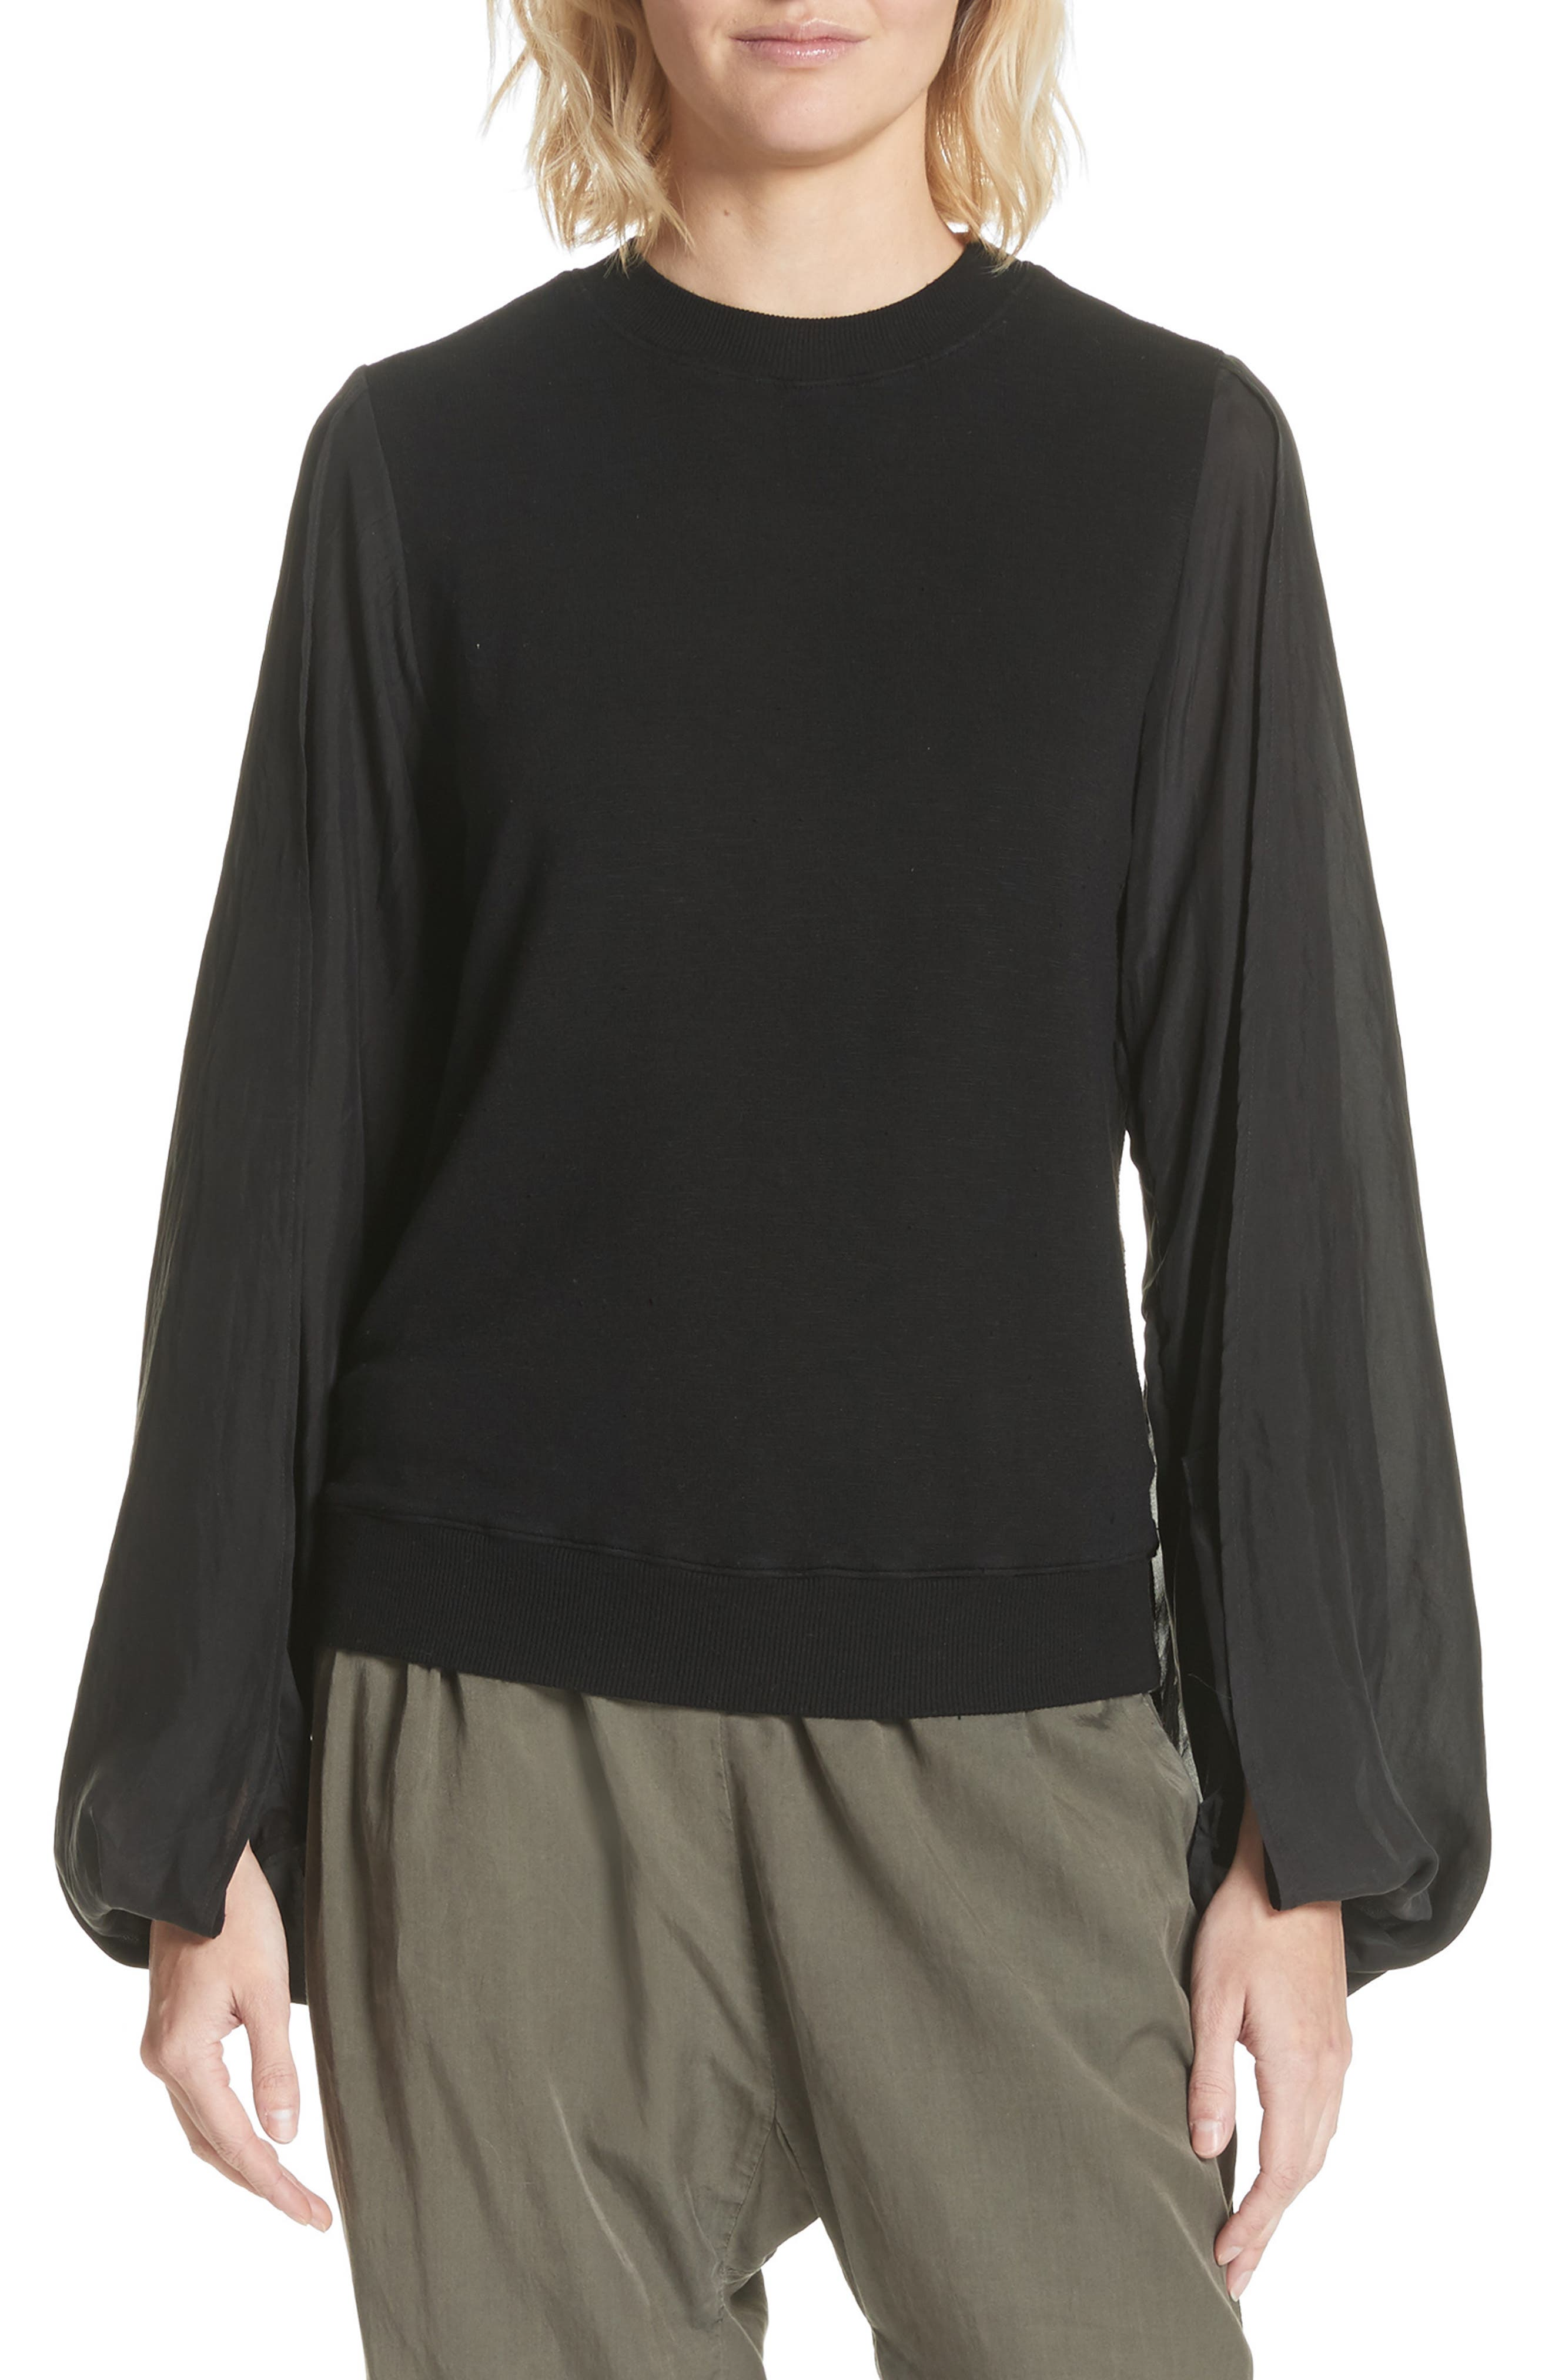 Contrast Sleeve Sweatshirt,                         Main,                         color, Black